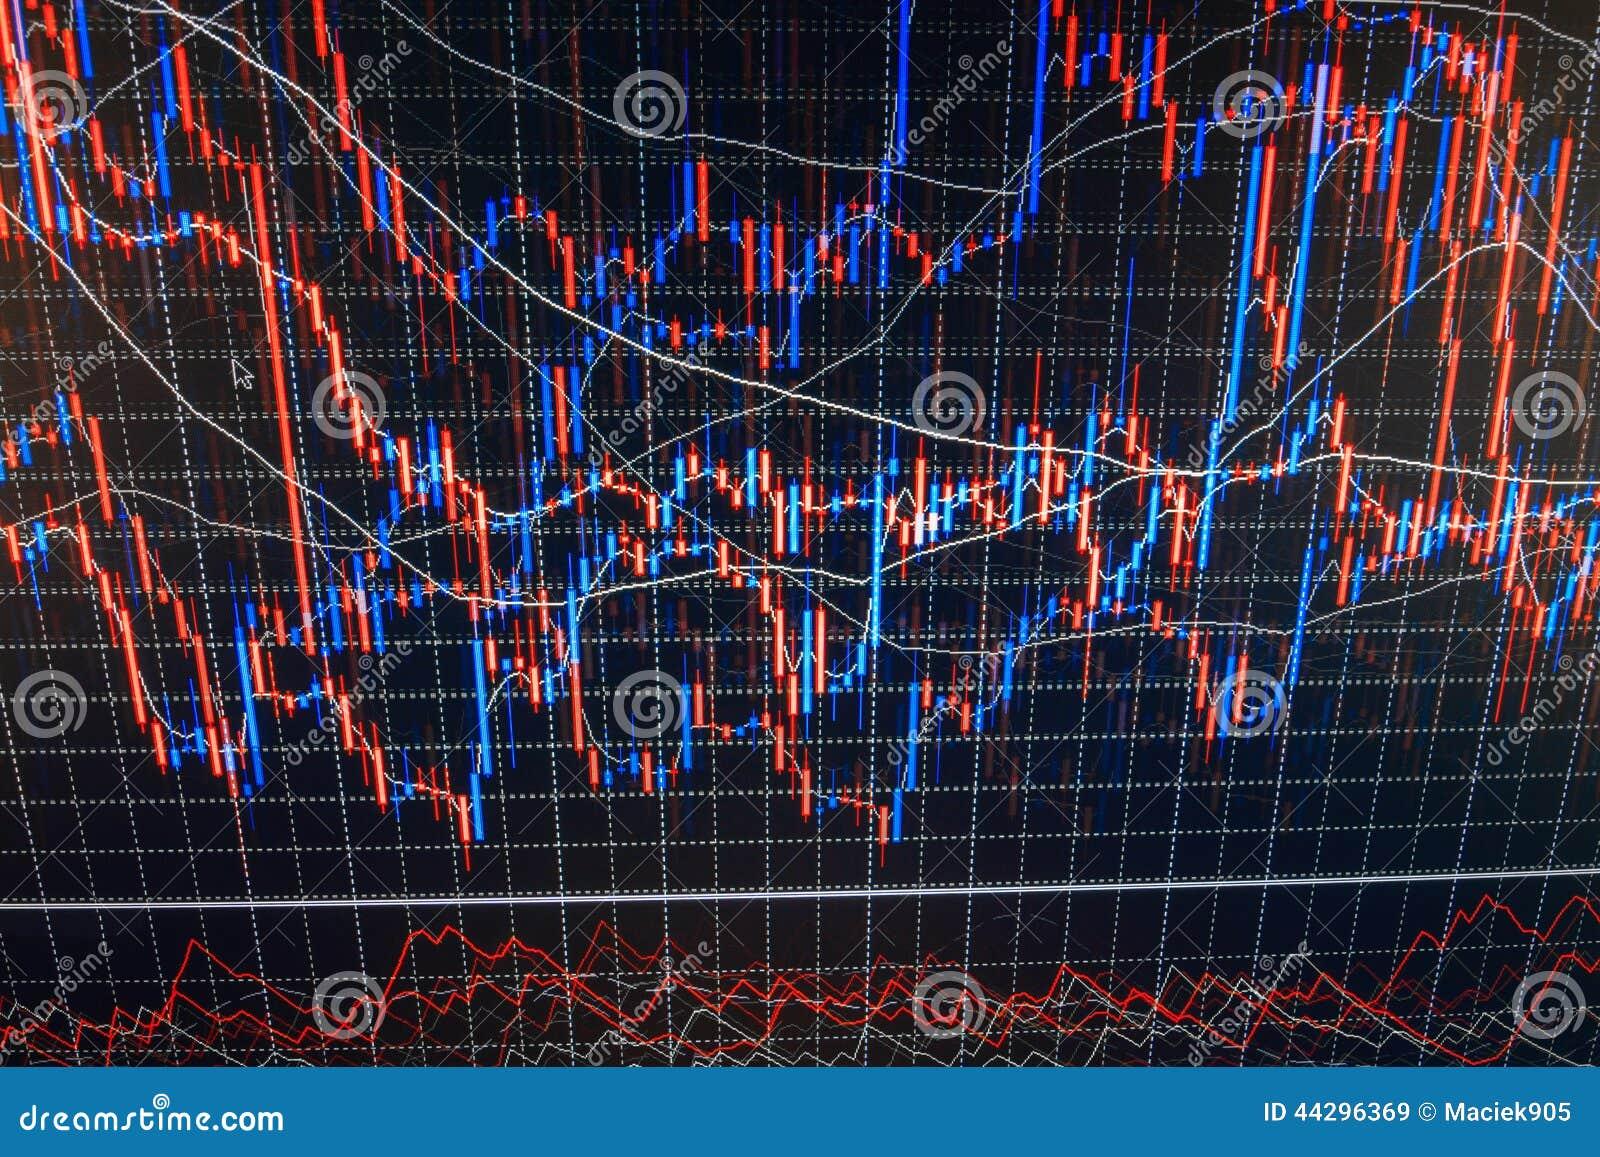 mercato azionario binario